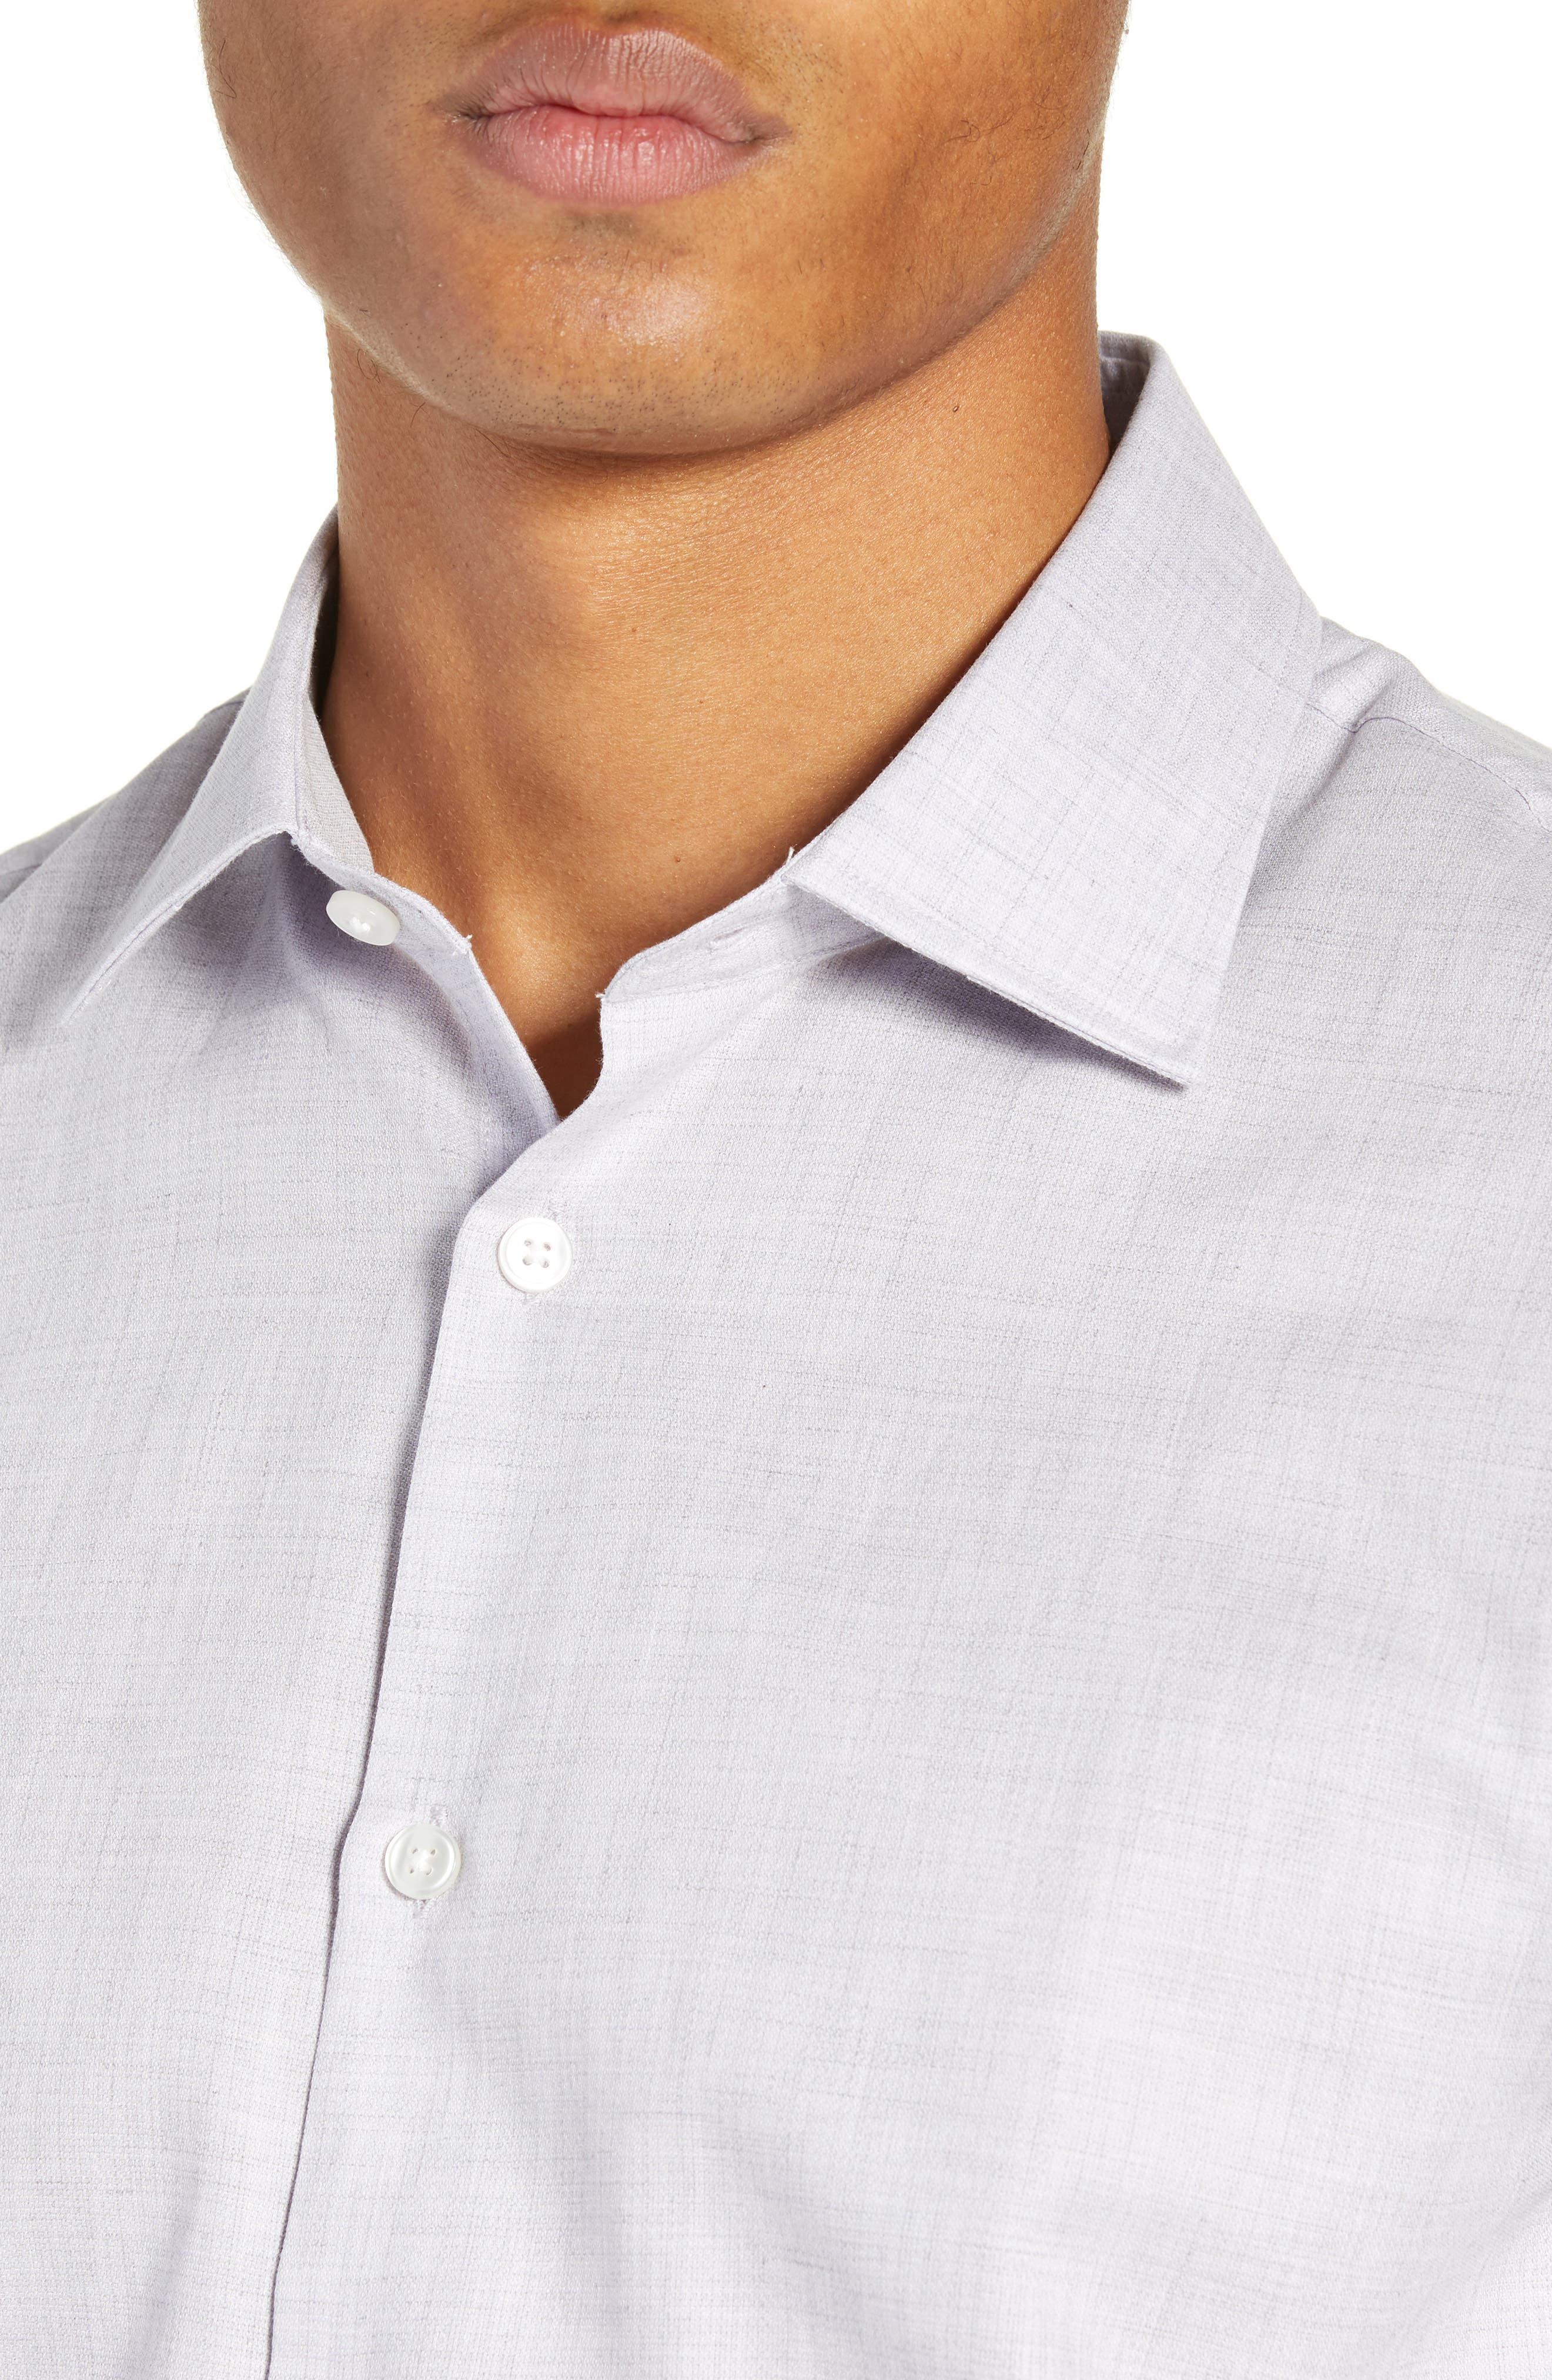 Regular Fit Solid Dress Shirt,                             Alternate thumbnail 2, color,                             HYDRANGEA